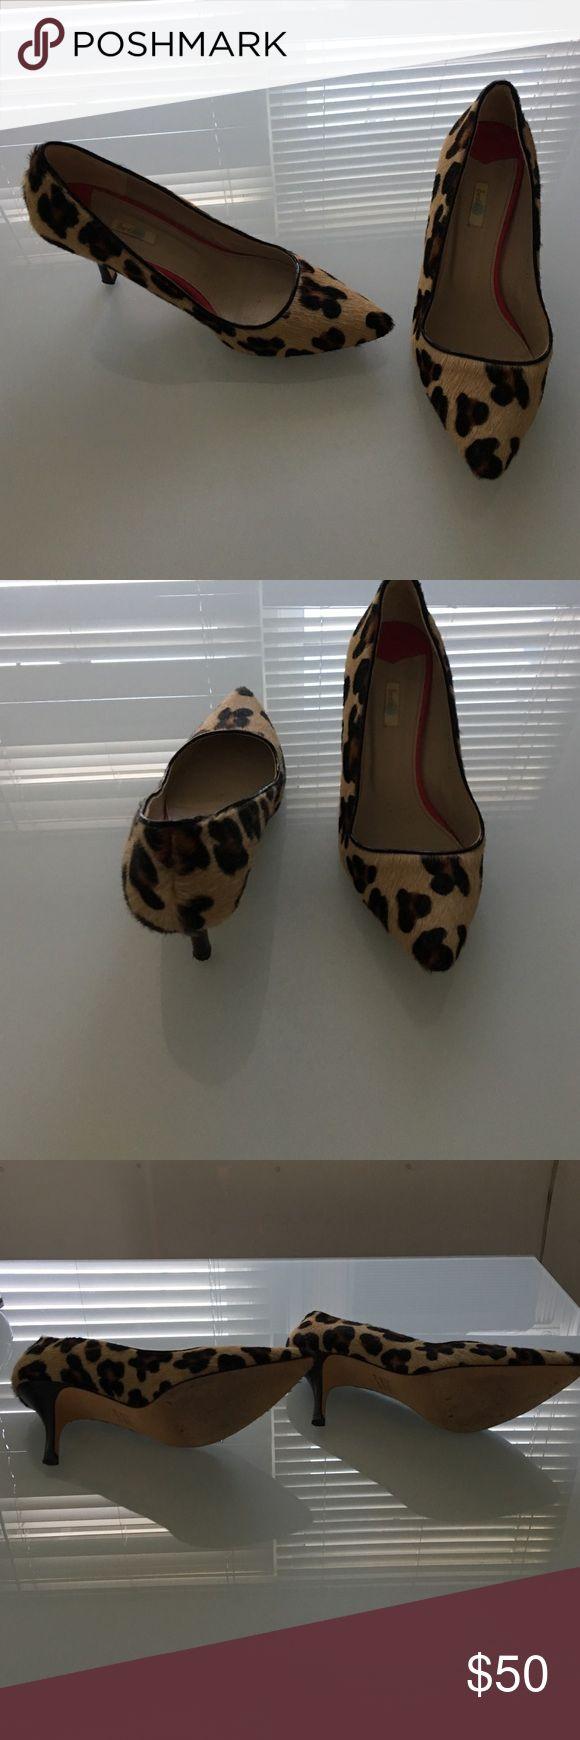 "Boden Leopard Print Pumps Boden leopard print pumps with 3"" heel, worn twice Boden Shoes Heels"